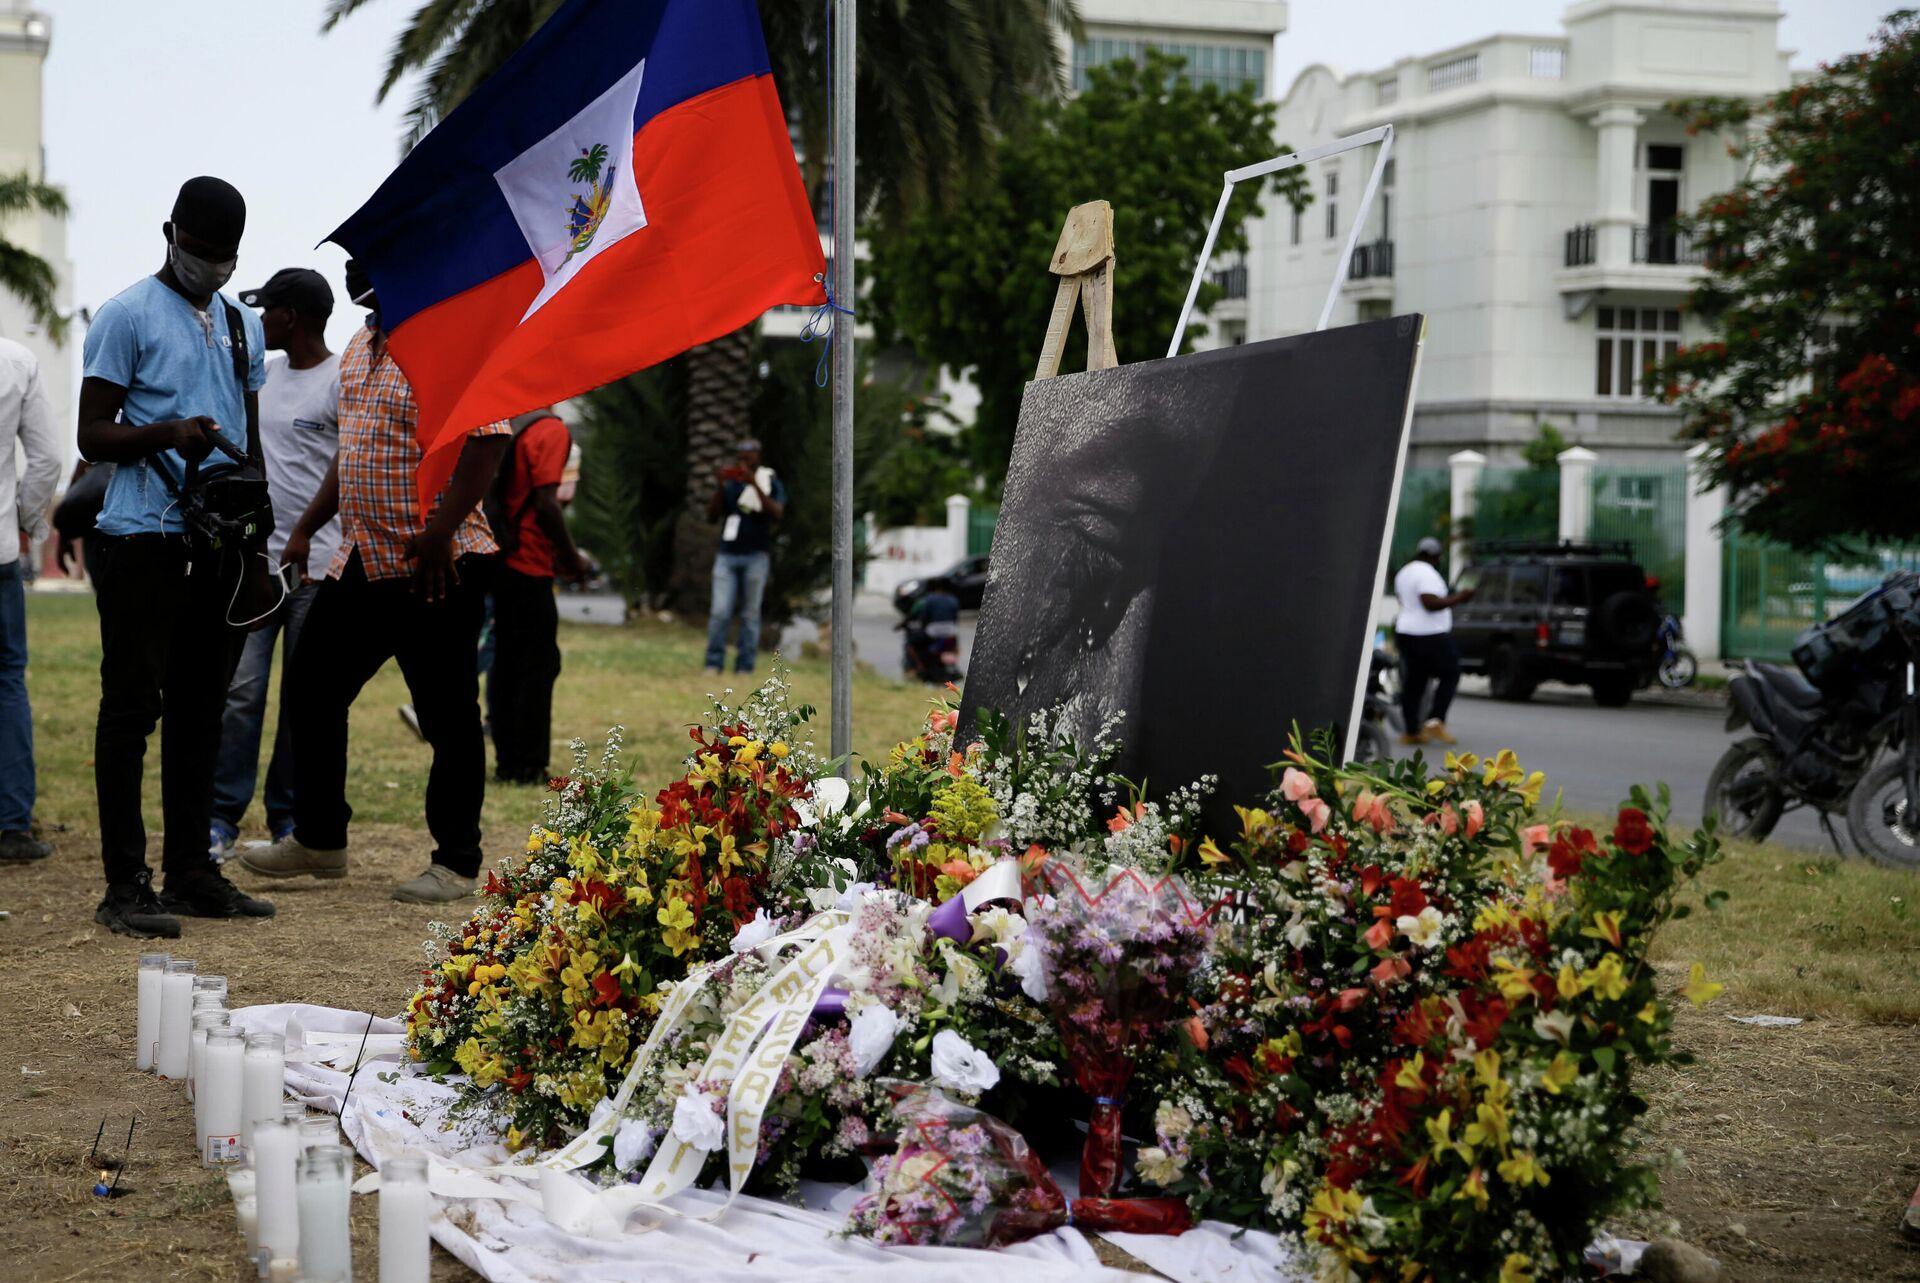 Homenaje al asesinado presidente de Haití, Jovenel Moise - Sputnik Mundo, 1920, 15.07.2021